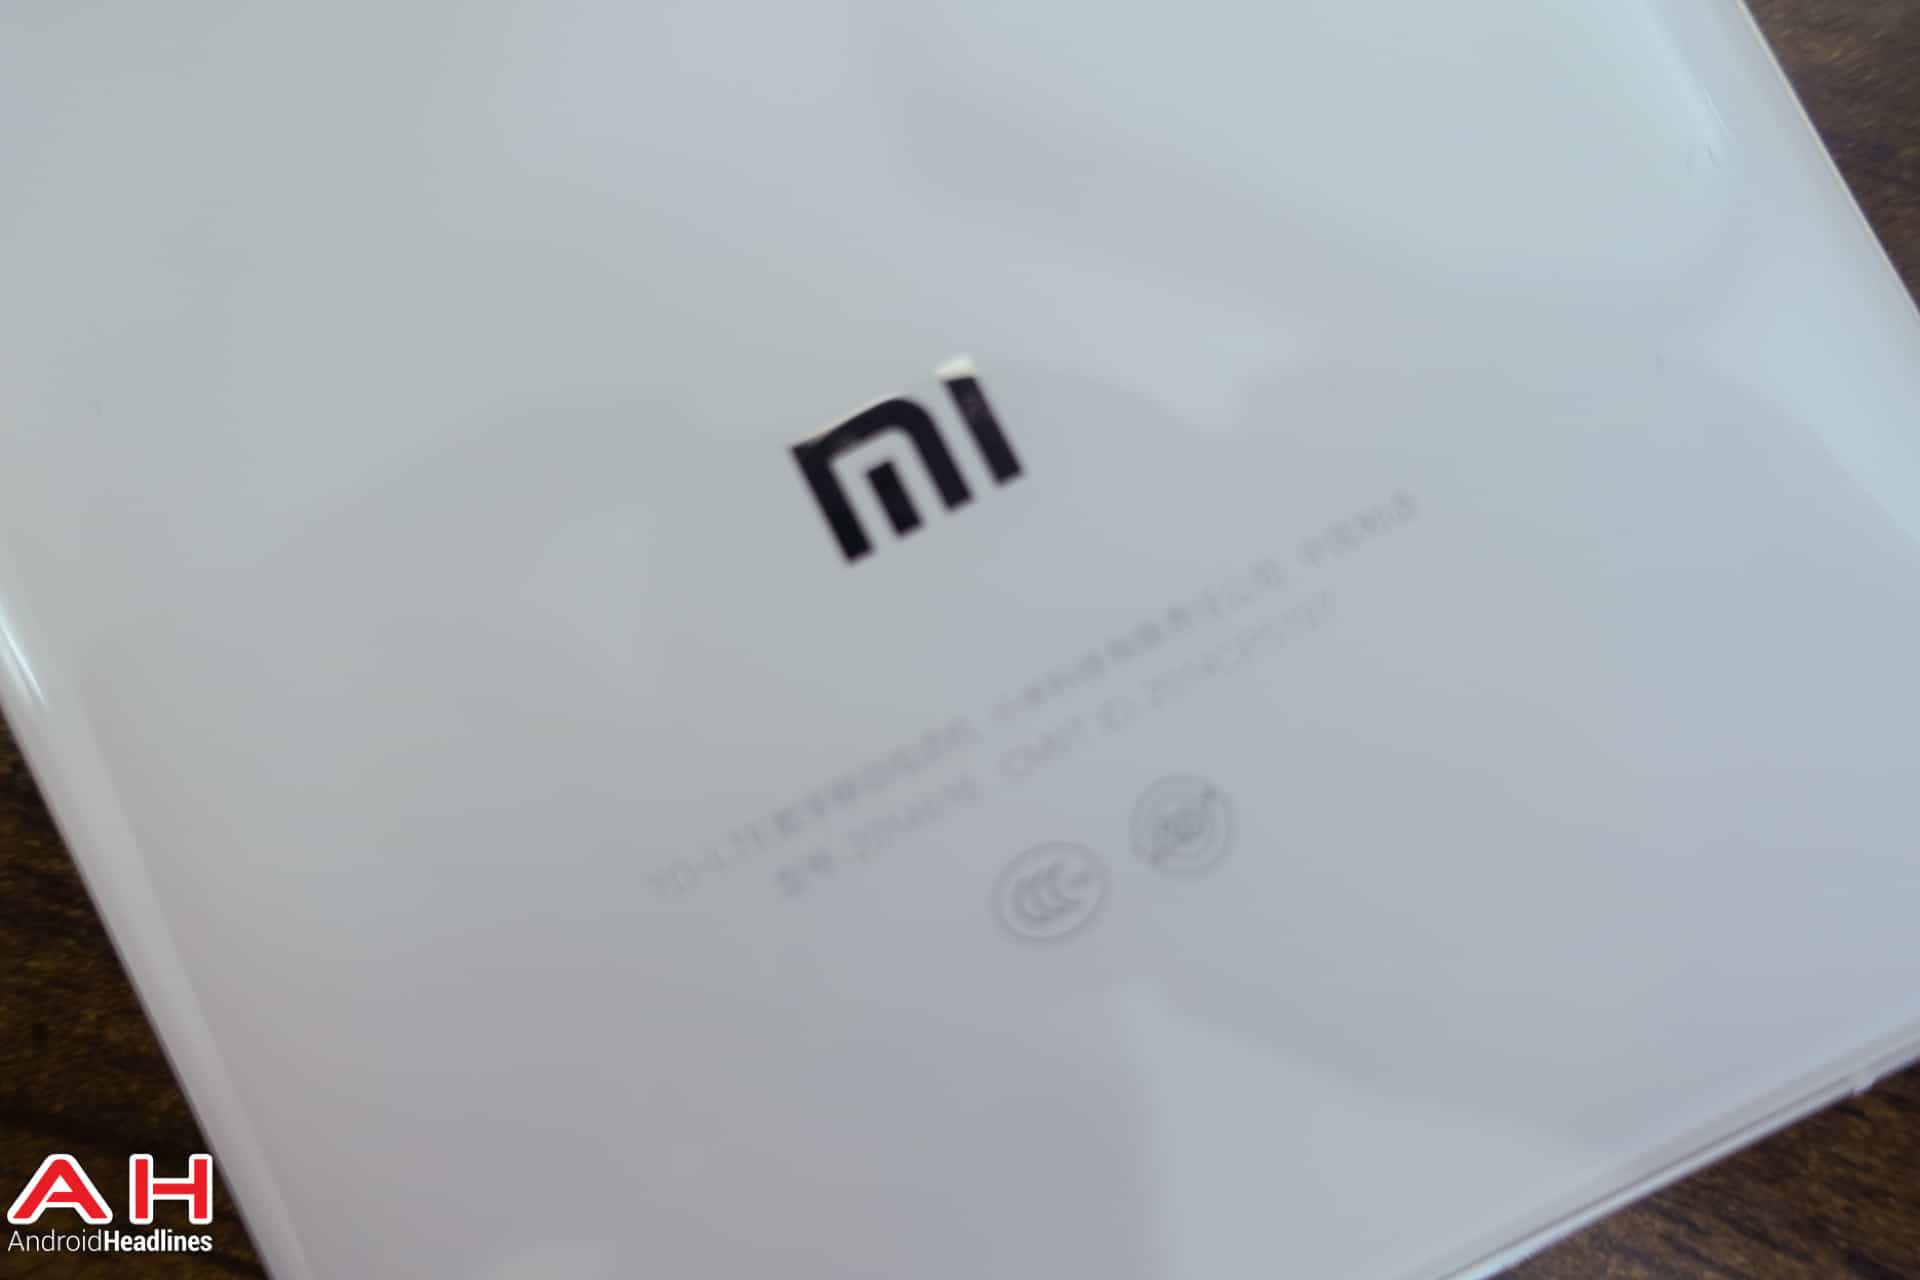 Xiaomi Mi Note AH 03769